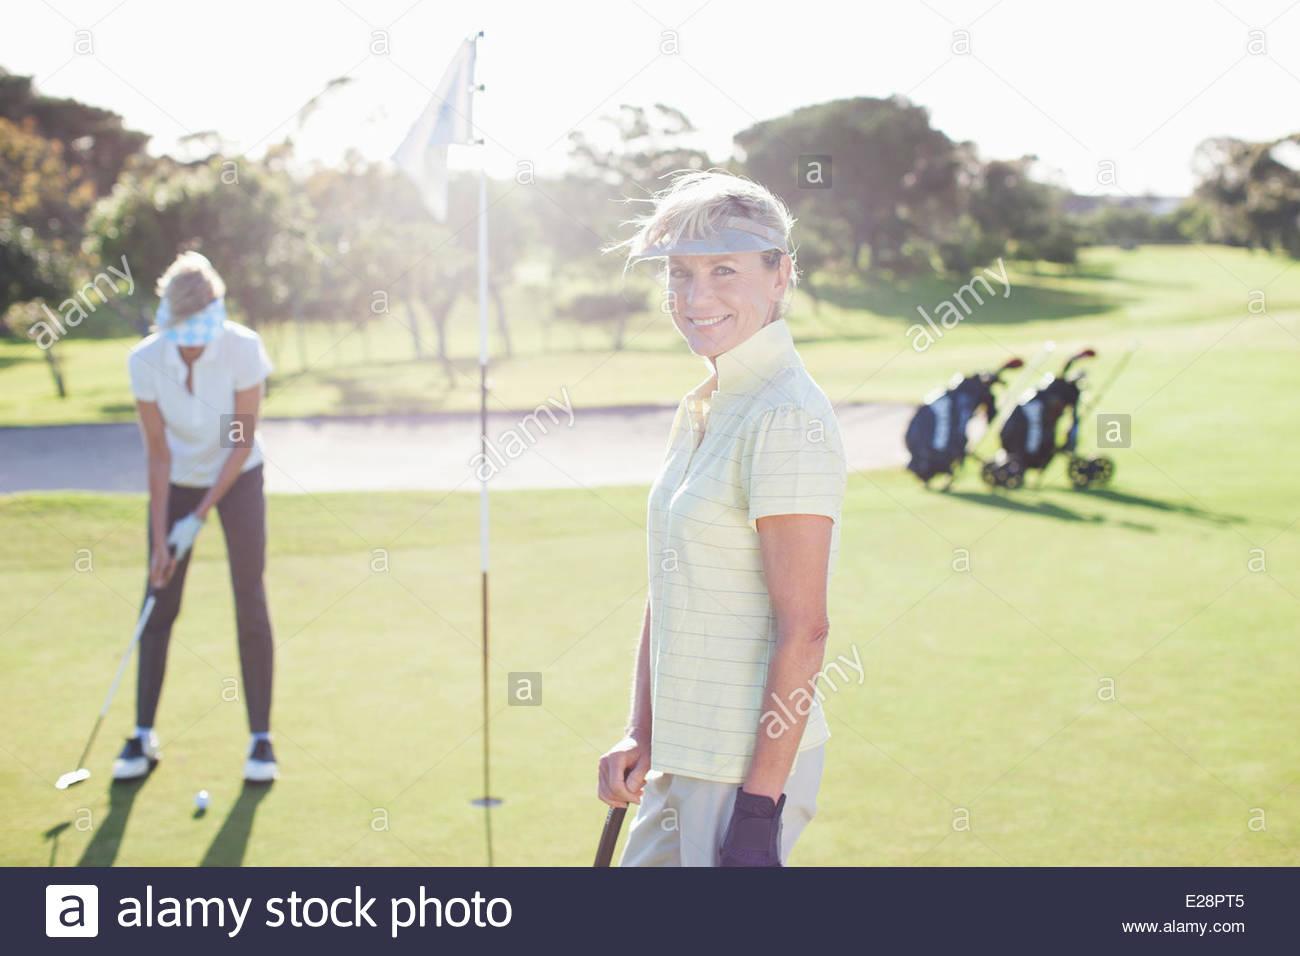 Frau posiert auf Golfplatz Stockbild